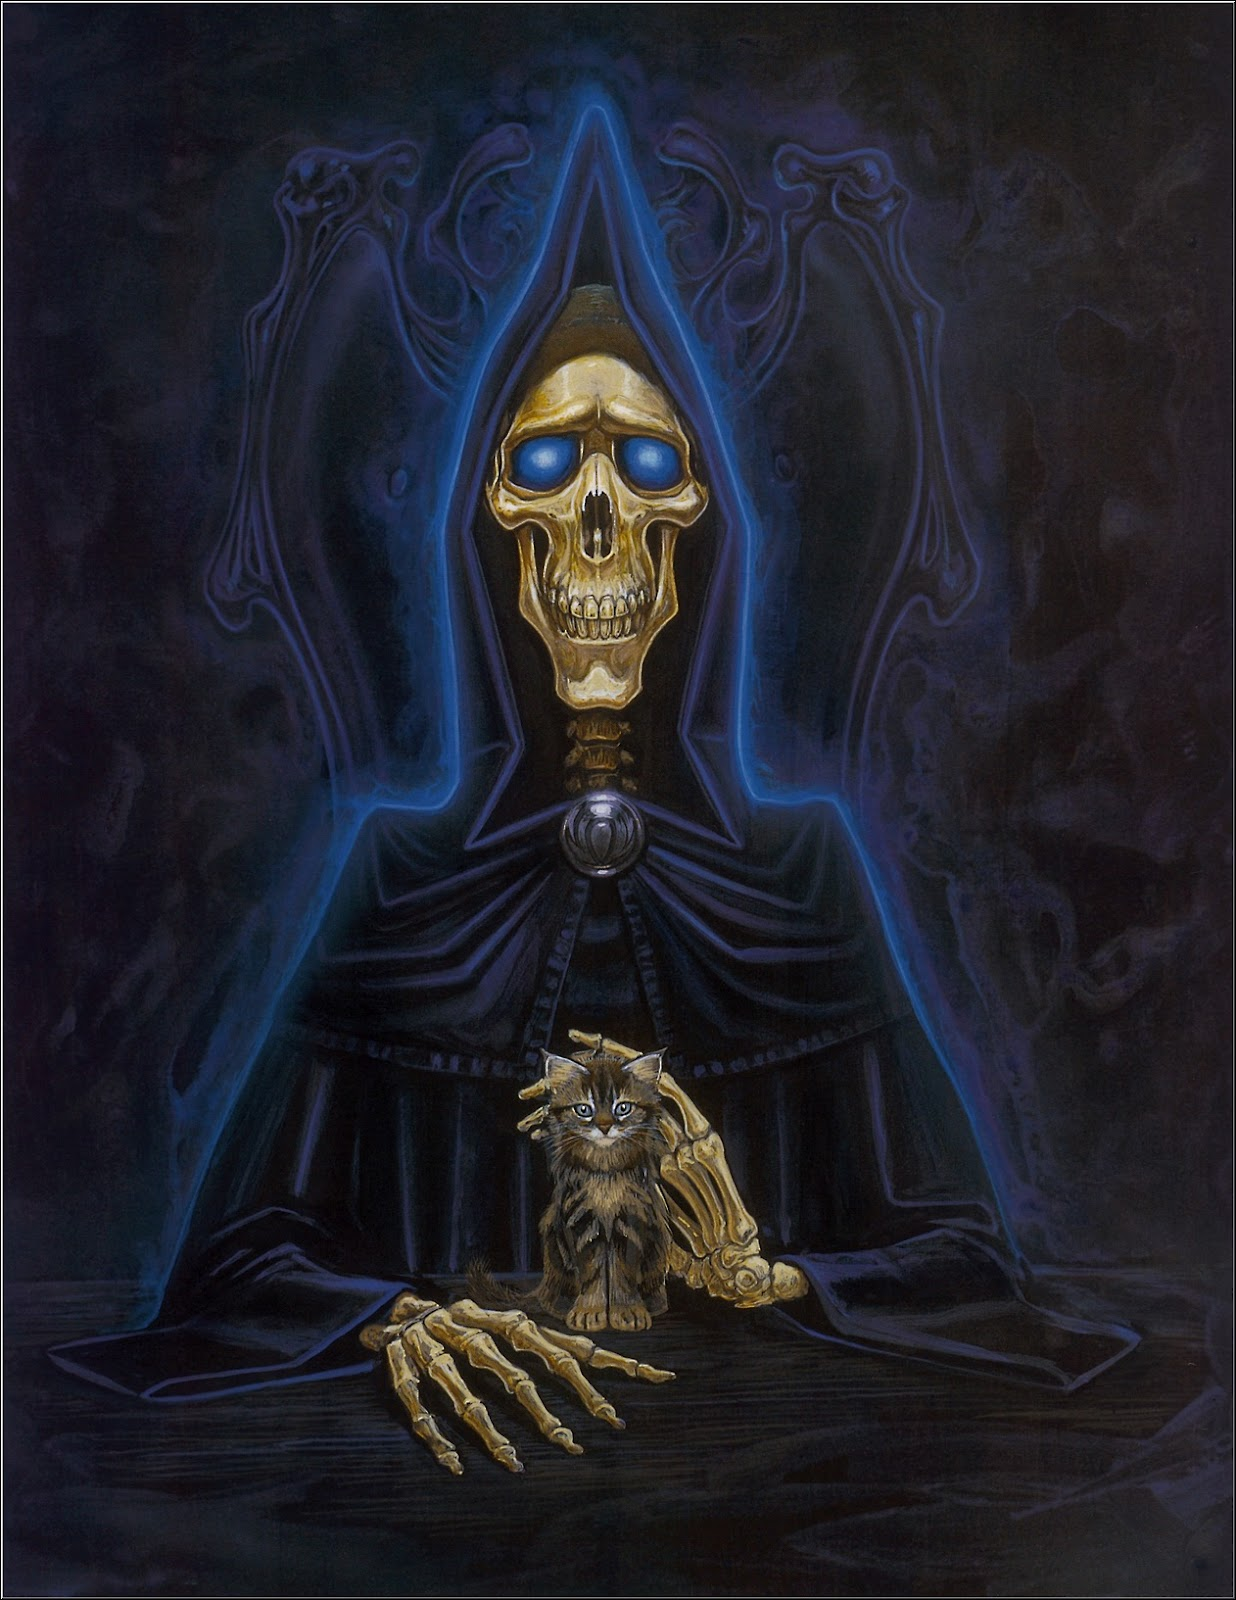 Discworld-3